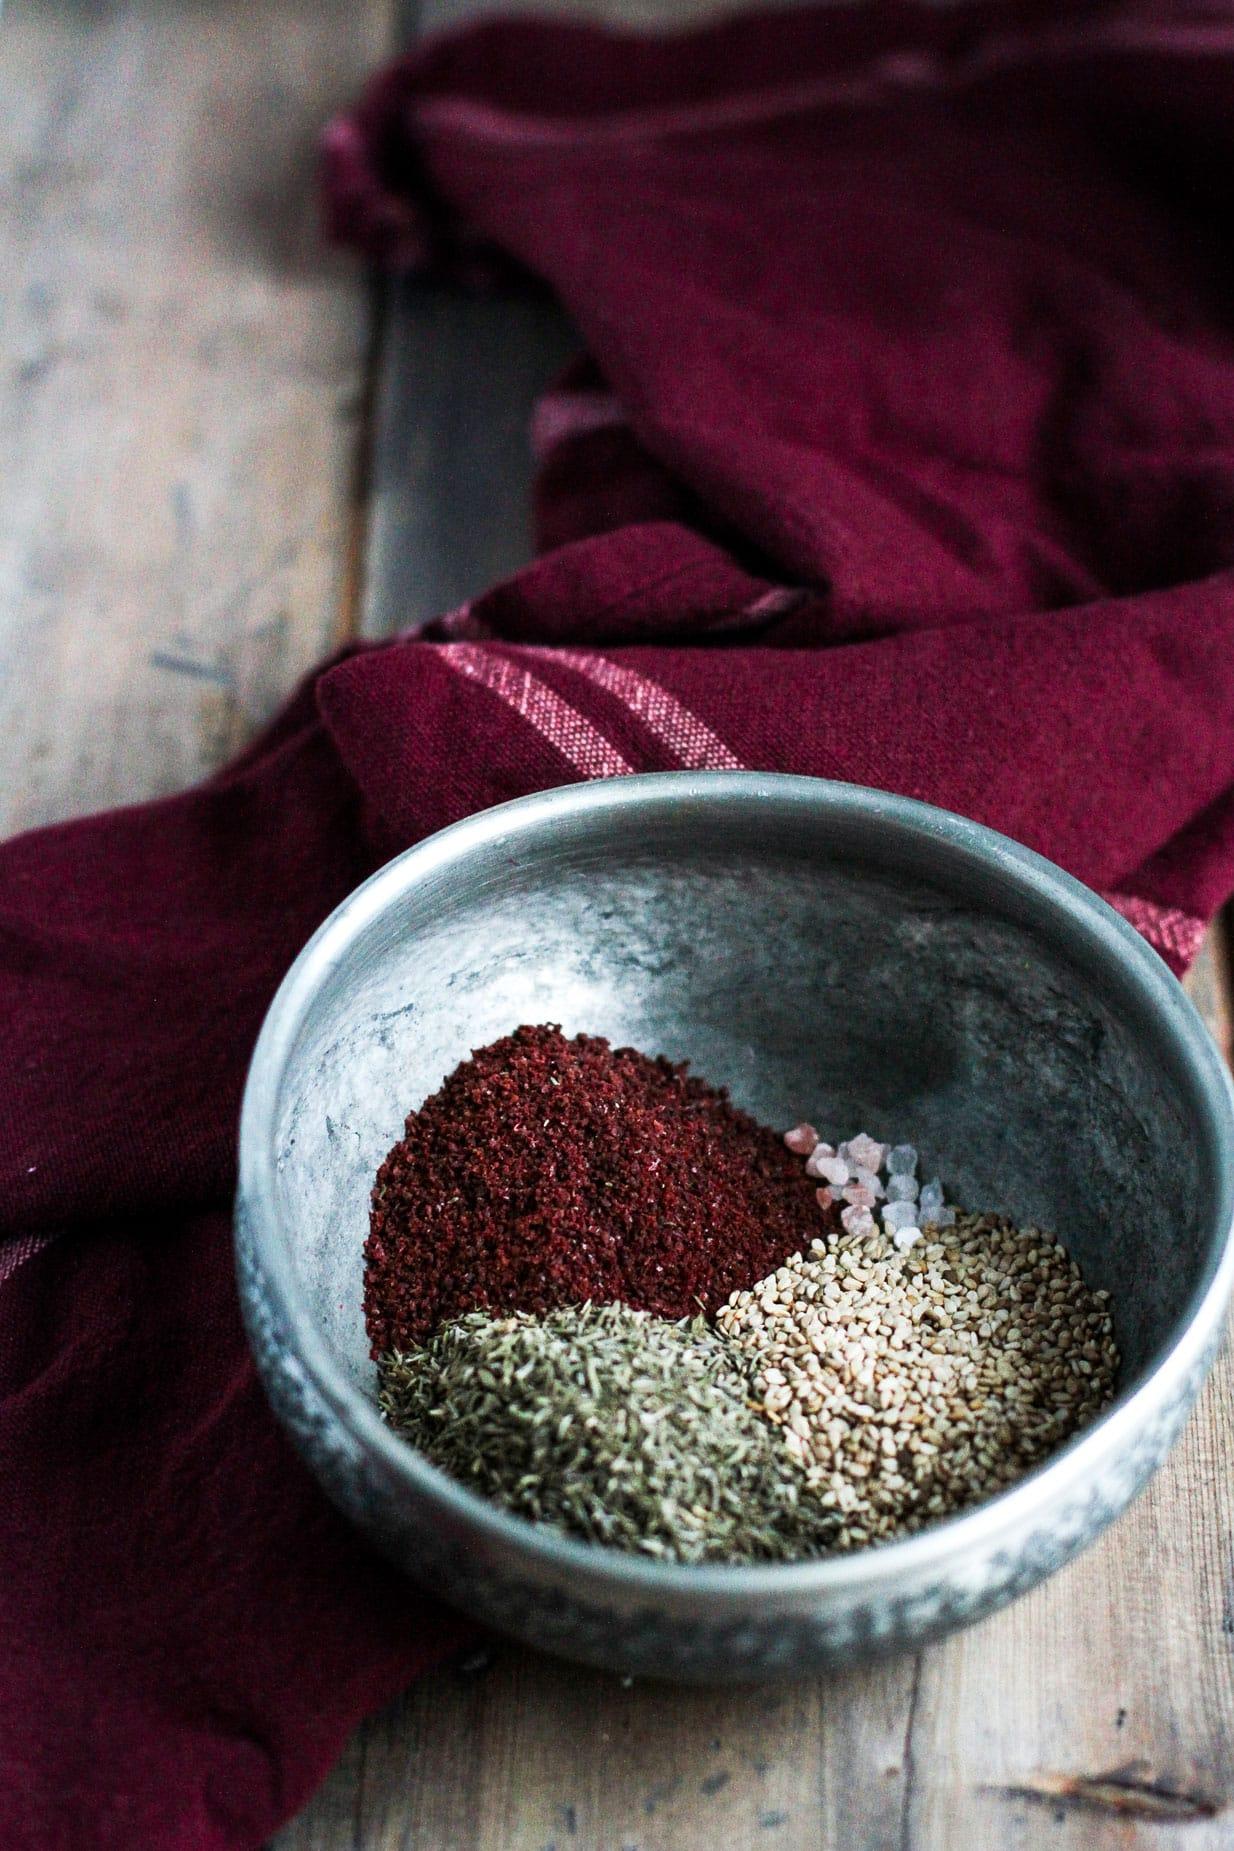 Homemade Za'atar Spice Blend